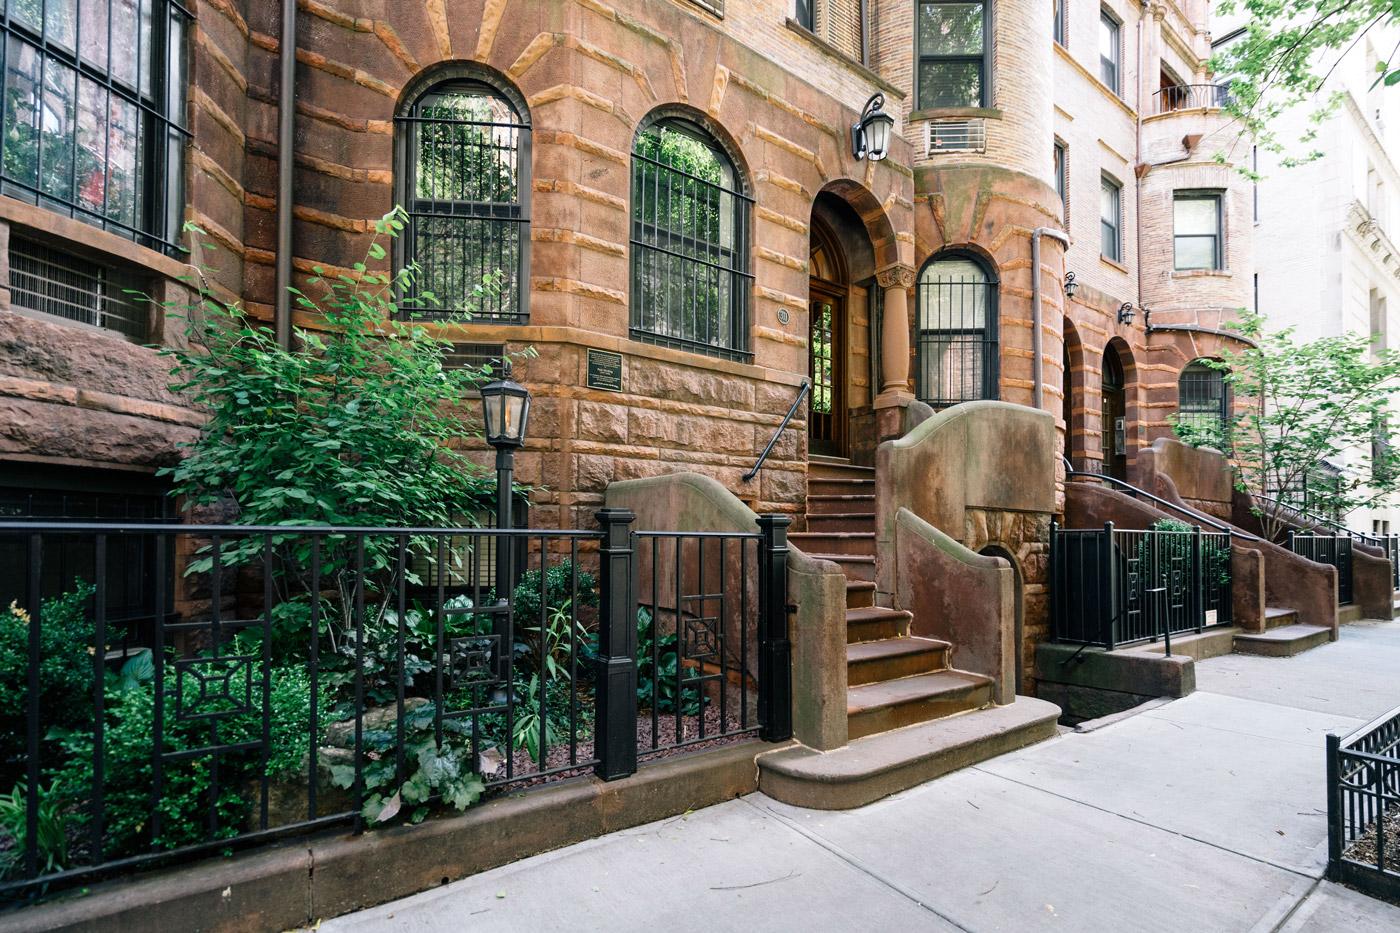 Brownstones in the Upper West Side in Manhattan